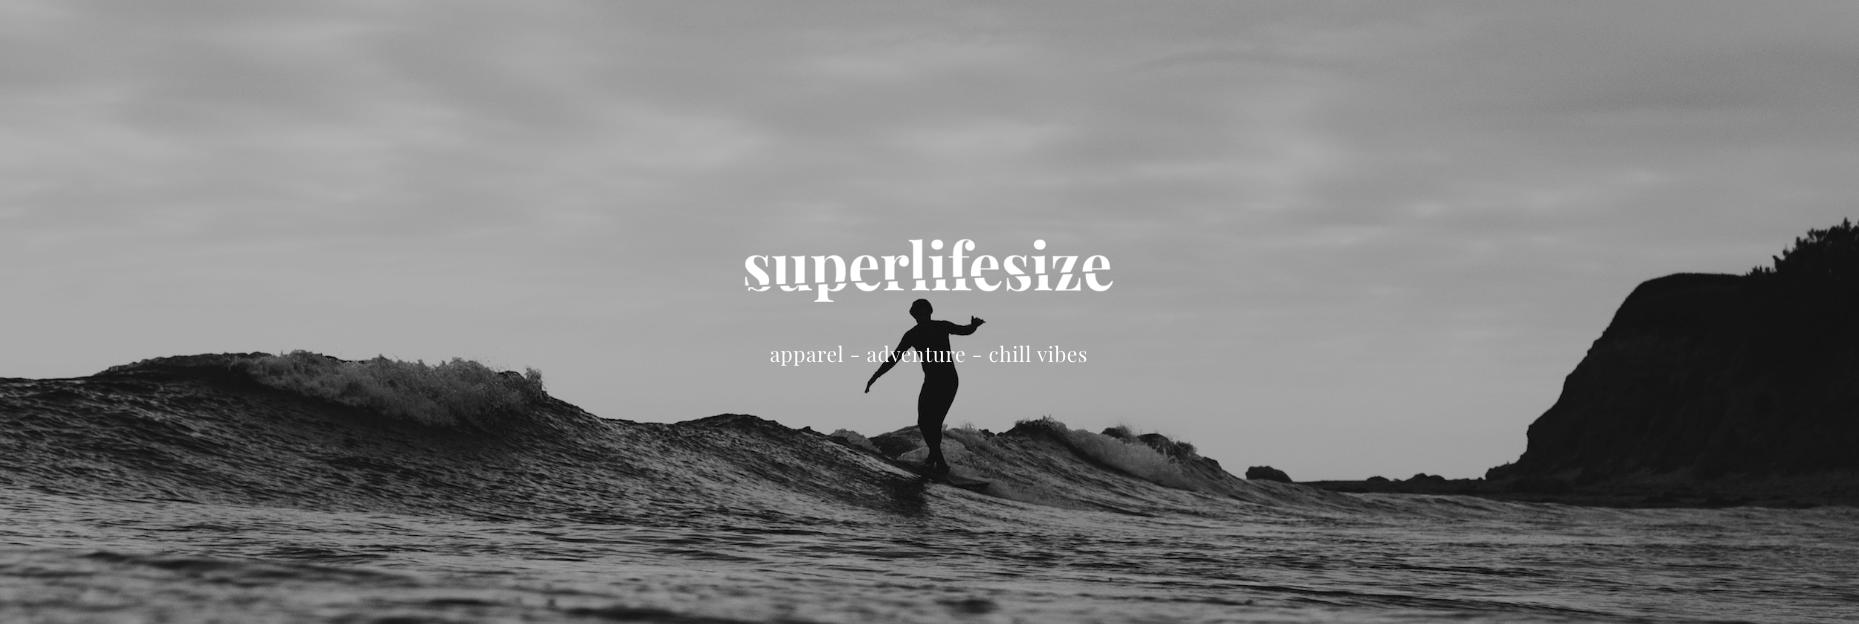 superlifesize-banner.png